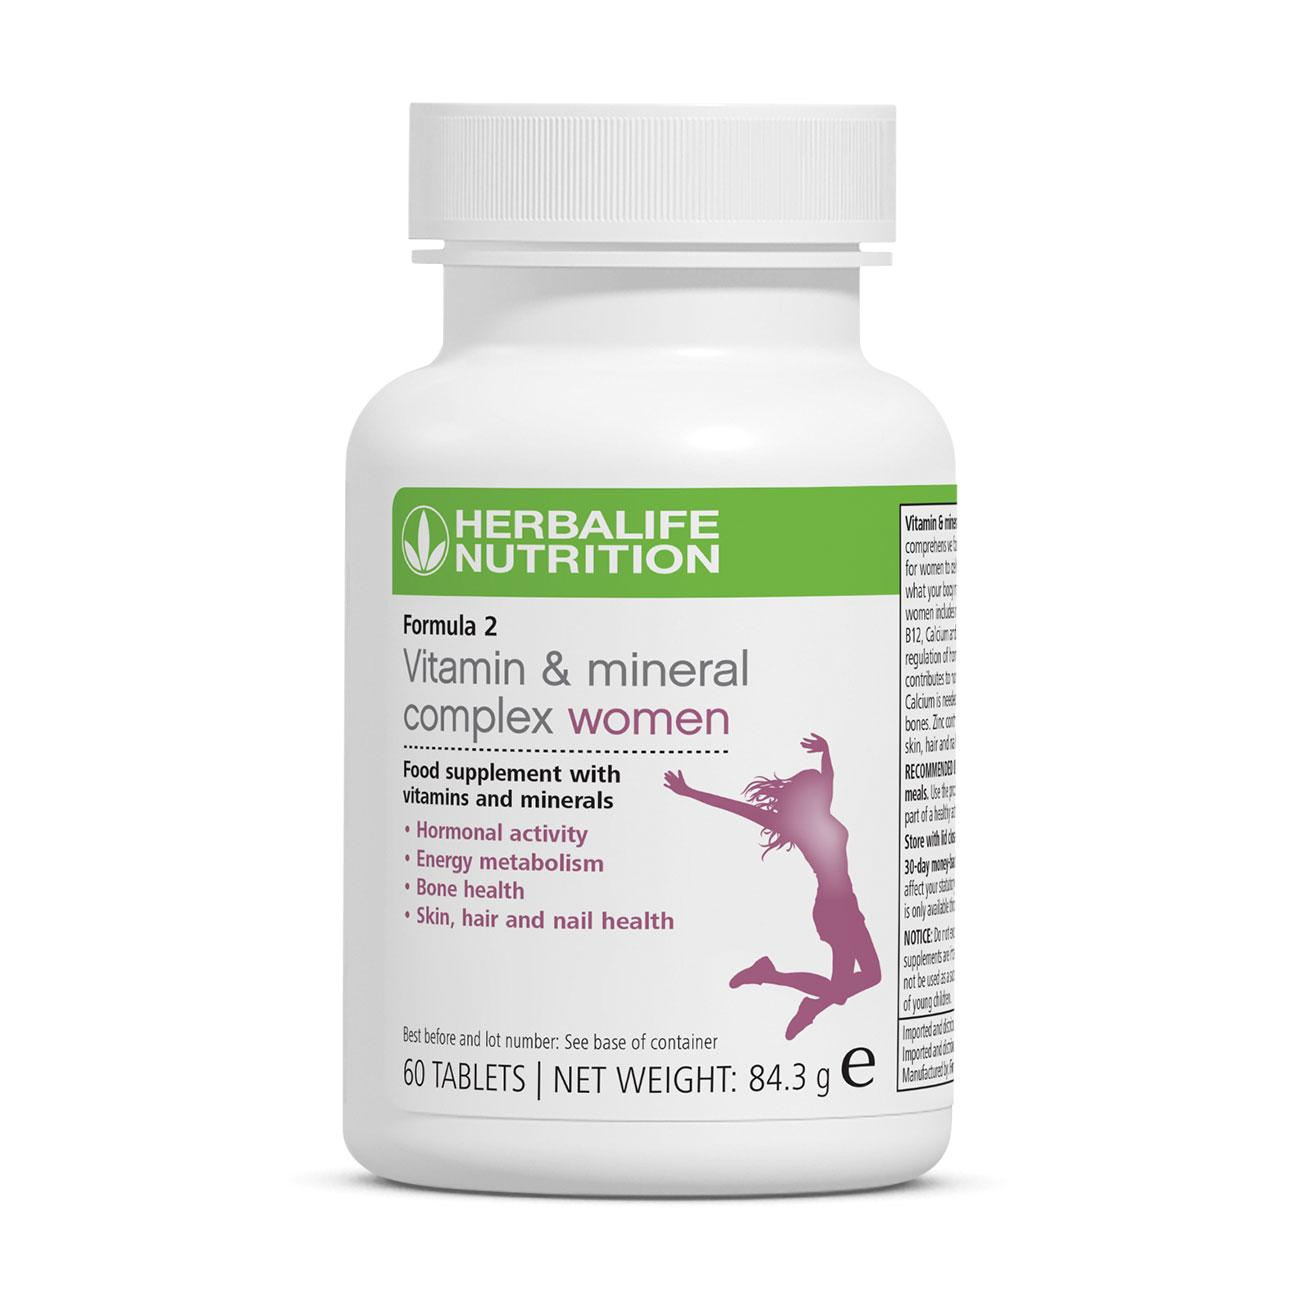 Formula 2 - Vitamin & Mineral Complex Women's 60 tablets